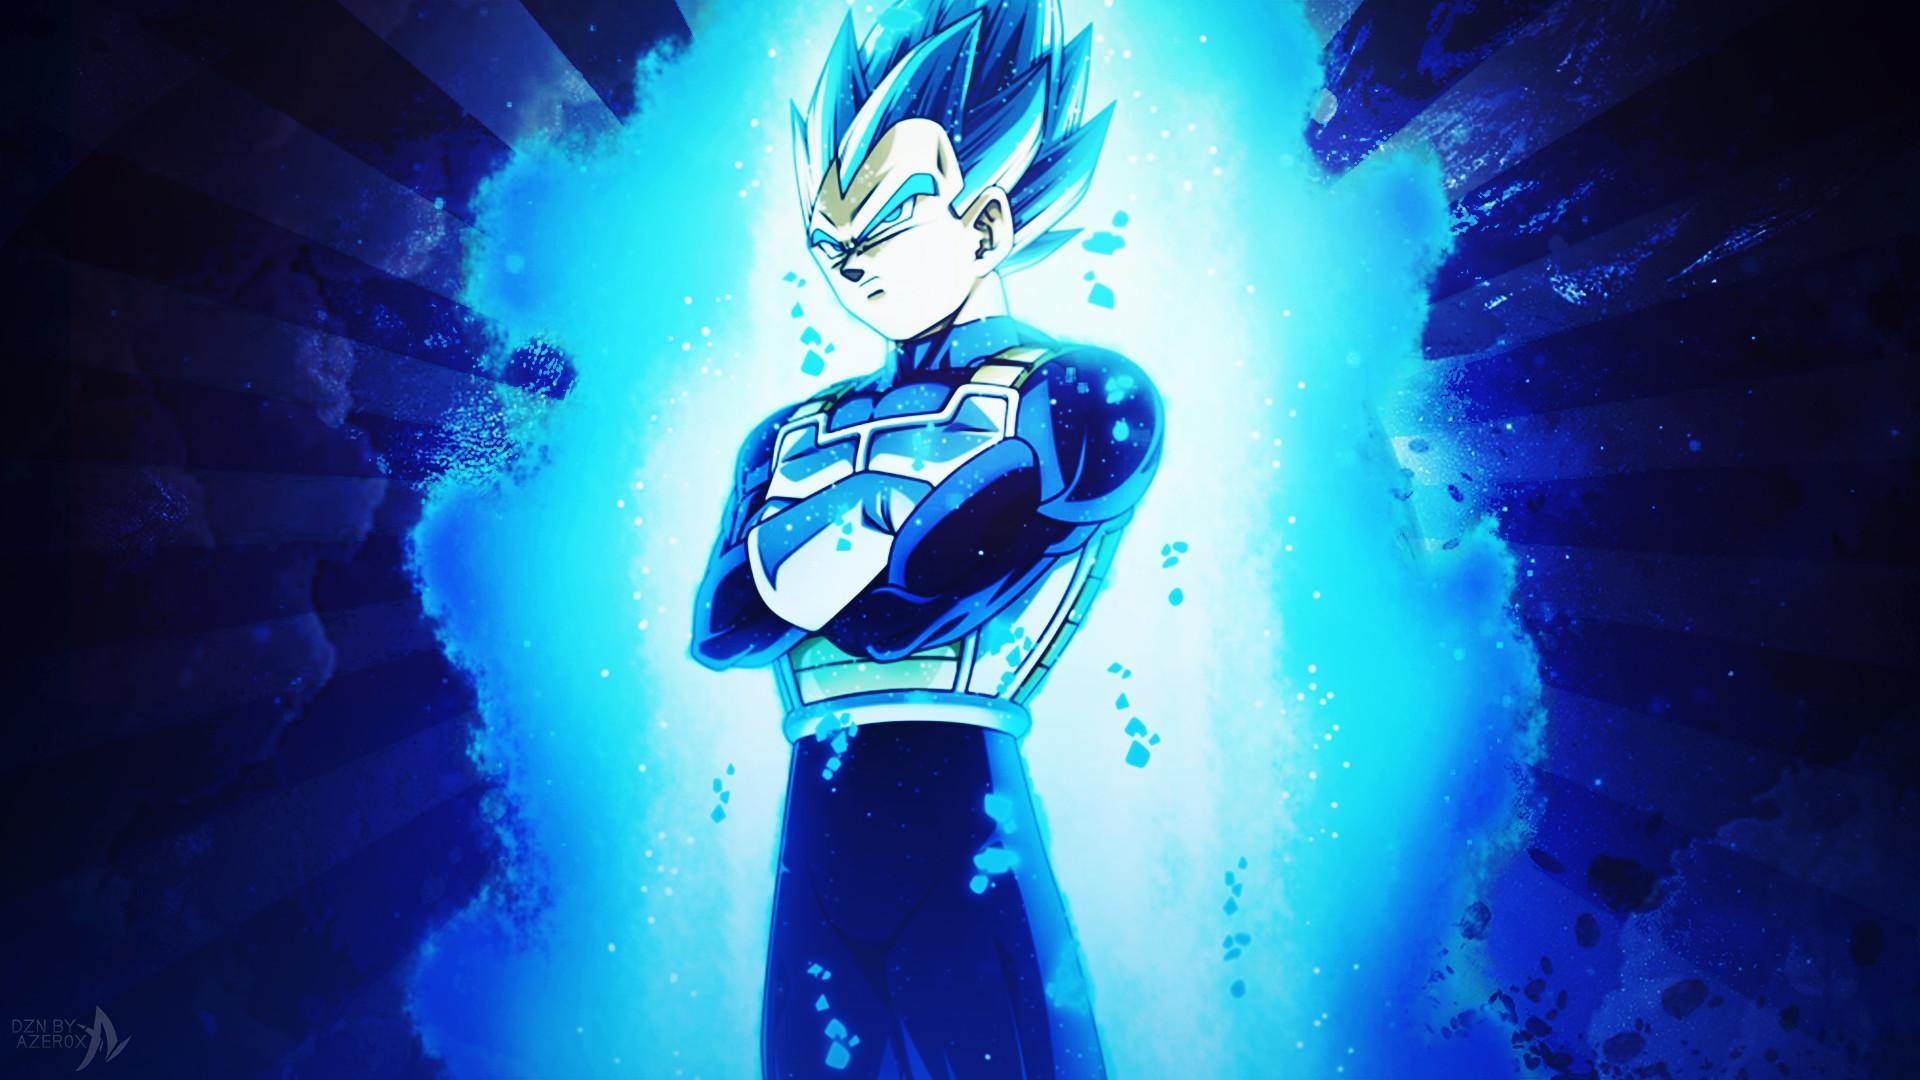 Download Vegeta Super Saiyan Blue Wallpaper Hd Backgrounds